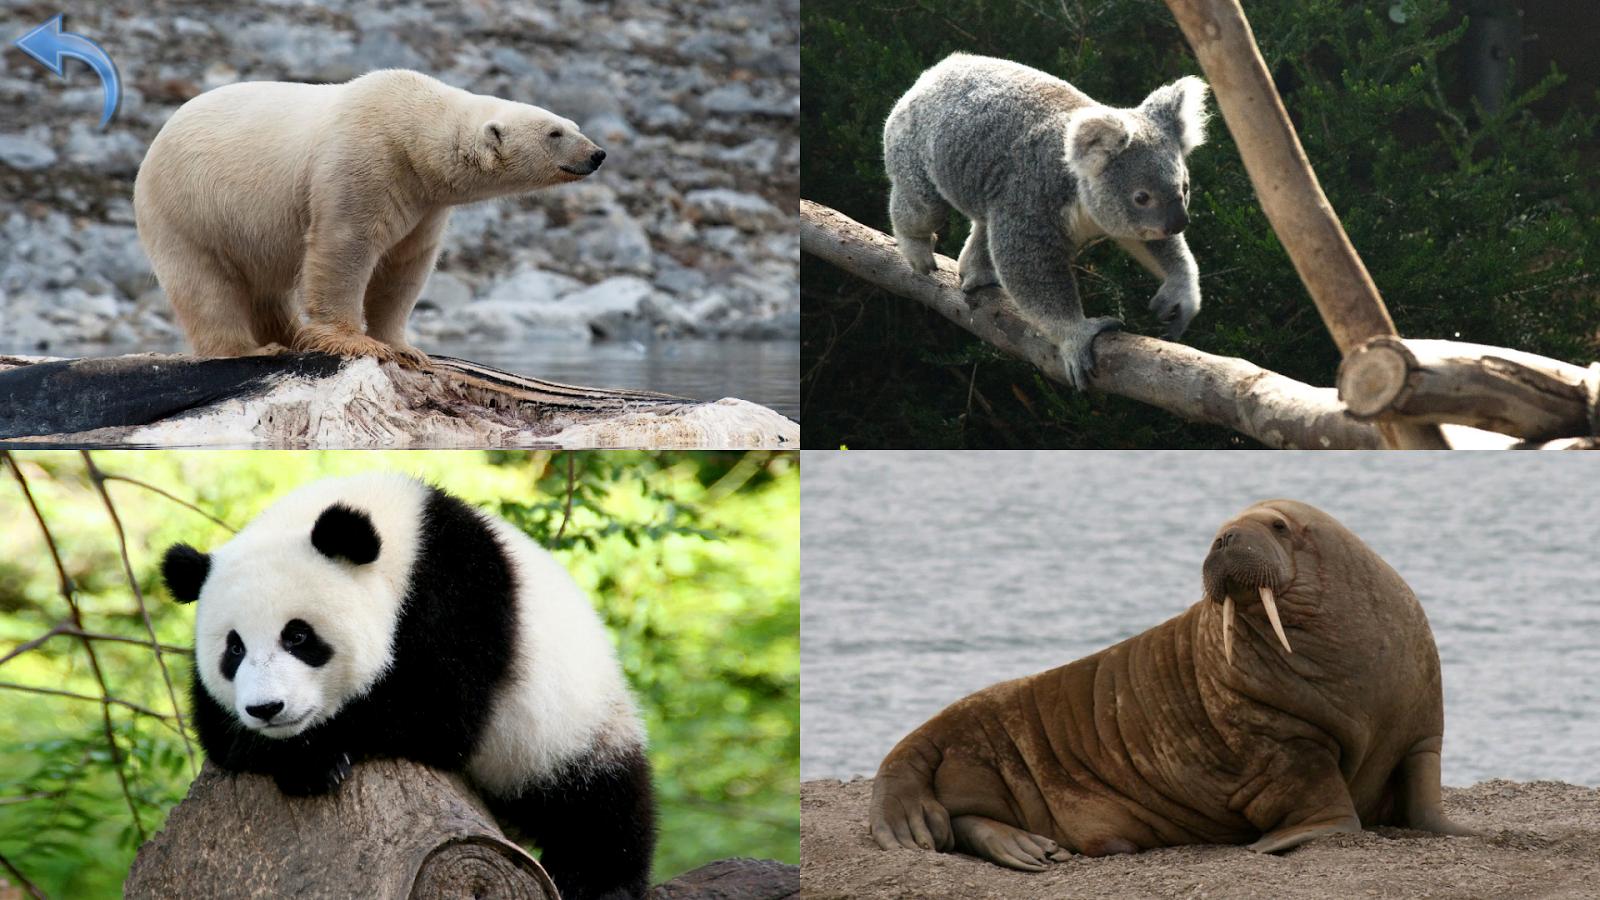 planet earth animals - photo #43